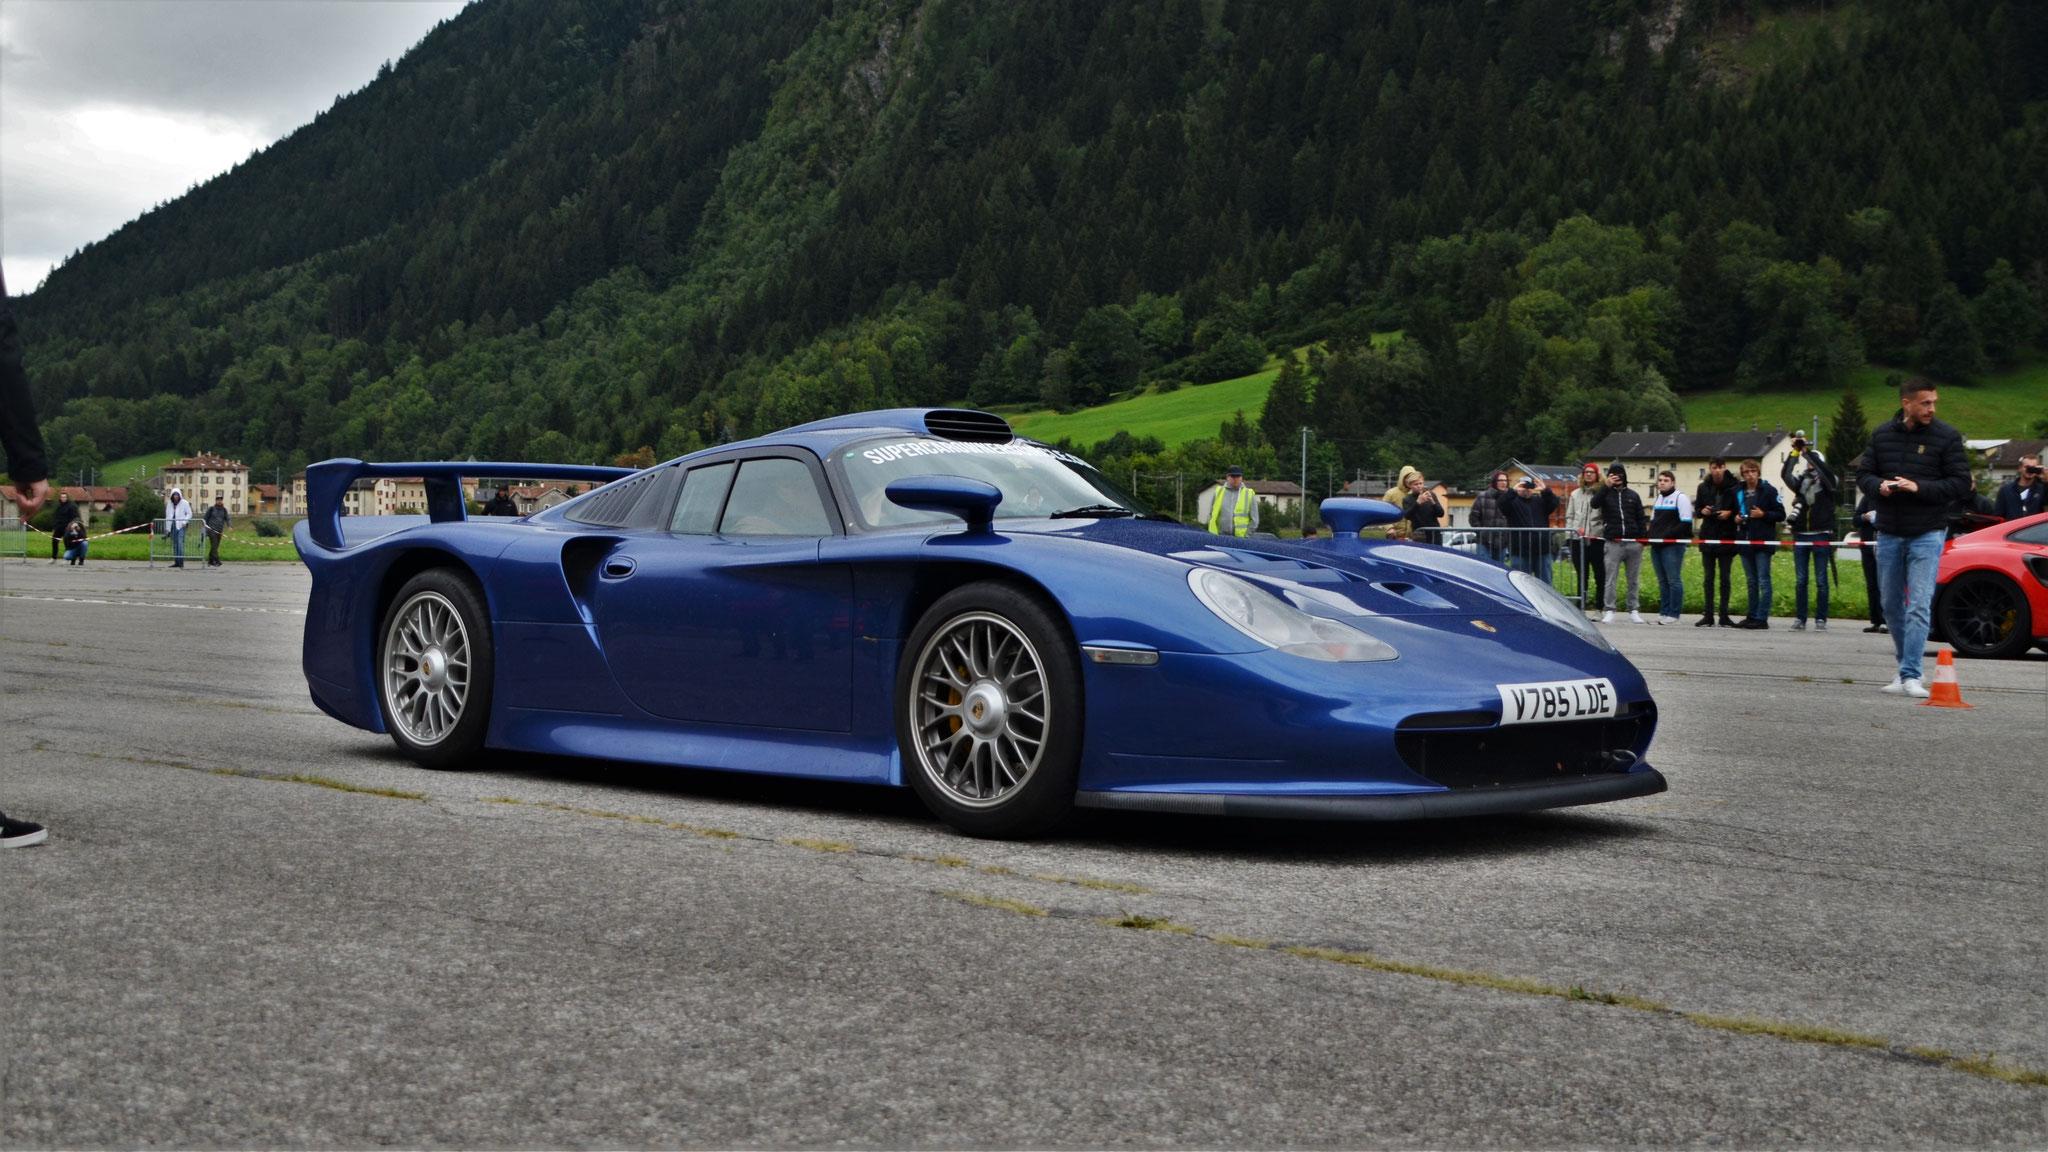 Porsche GT1 - V785-LDE (GB)